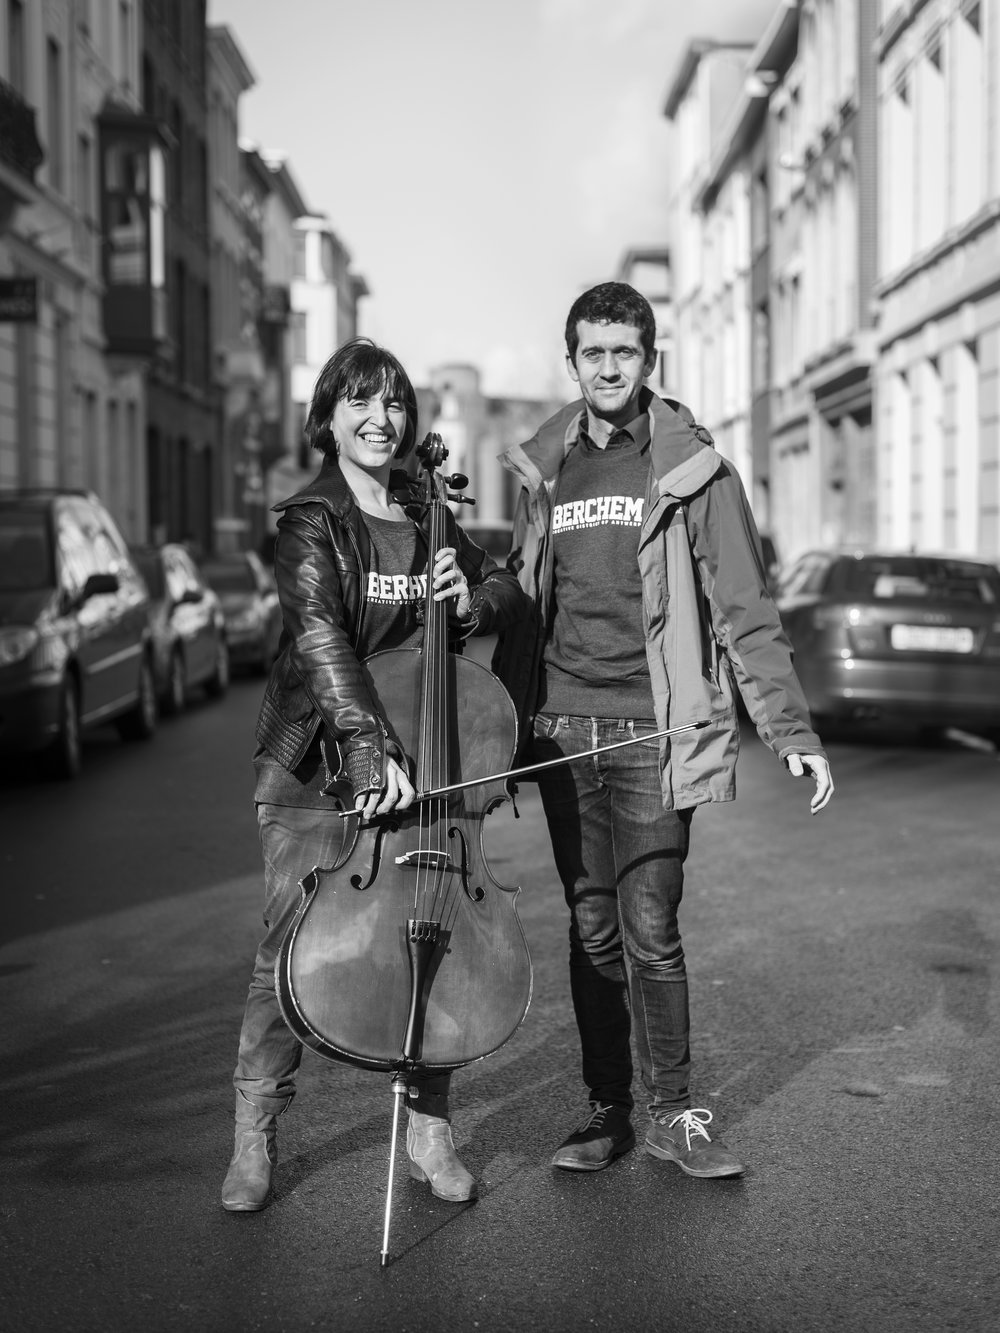 Straatportret - Isabel & Pieterjan 4x3.jpg